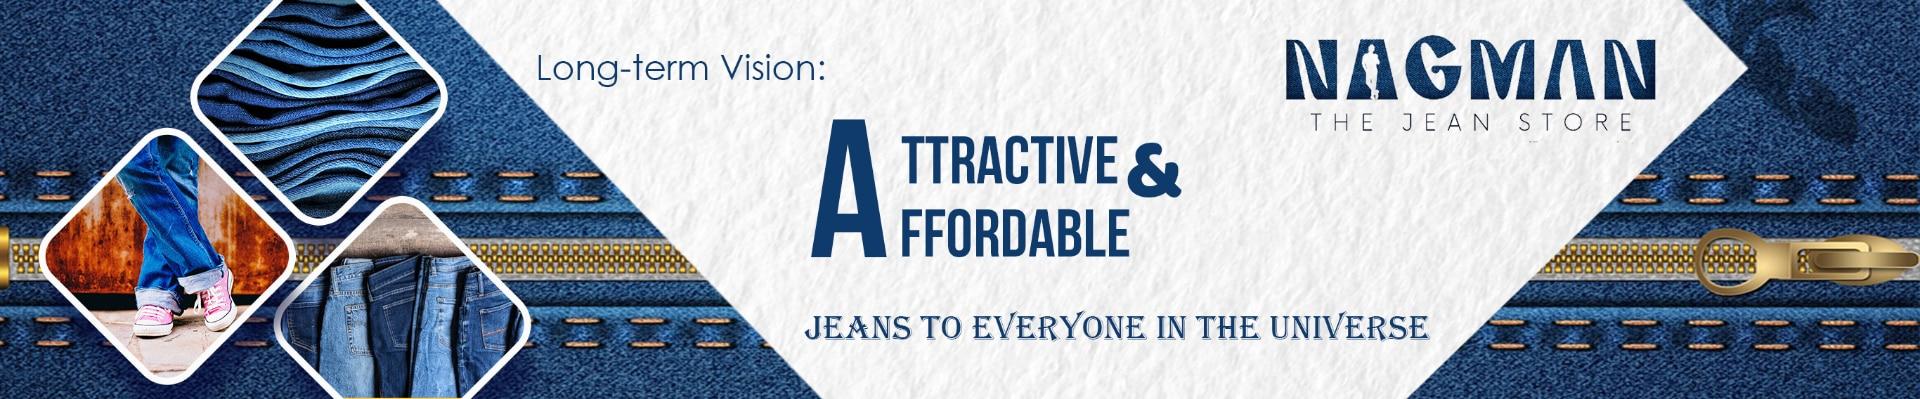 NagmaN - Denim Jeans Manufacturer in Vilangudi Byepass, Madurai